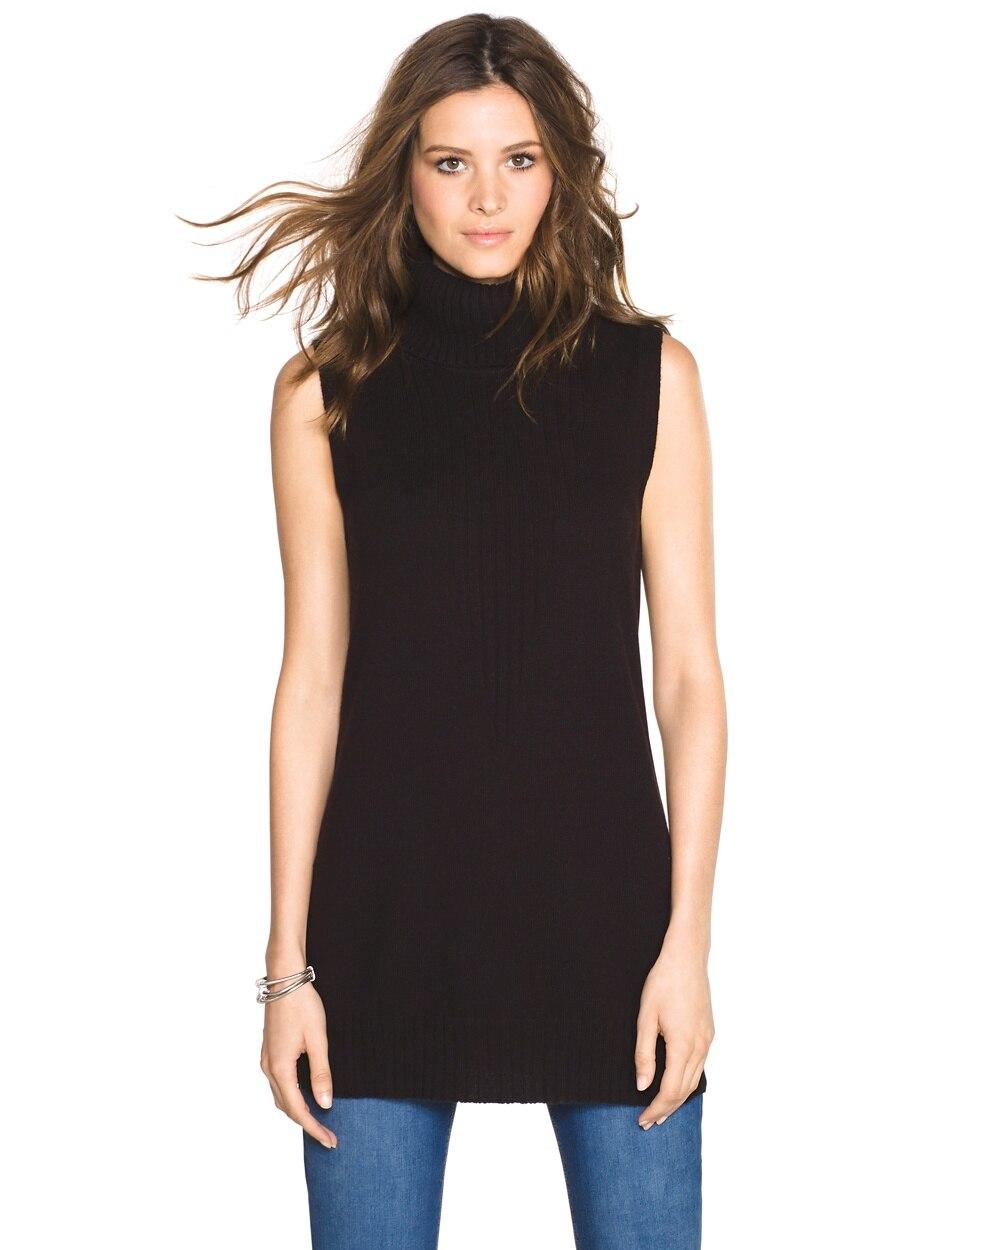 0412839ae1081b Sleeveless Turtleneck Sweater - White House Black Market